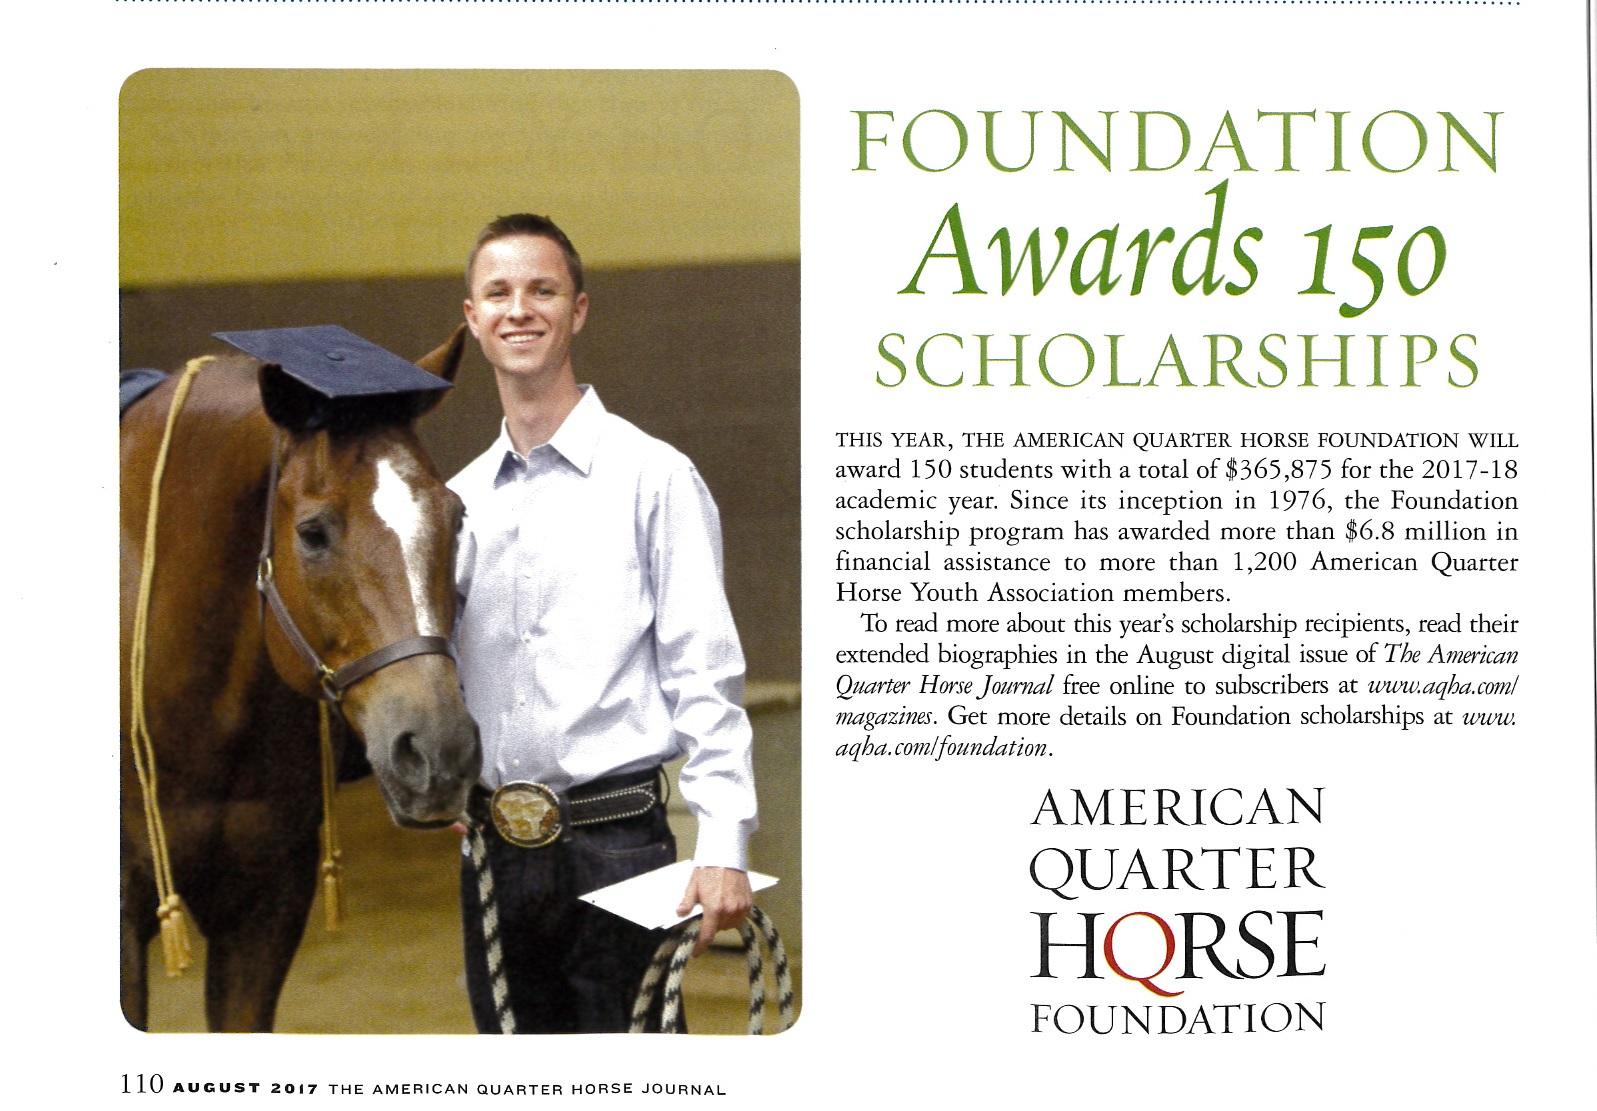 AQHA Foundation Awards